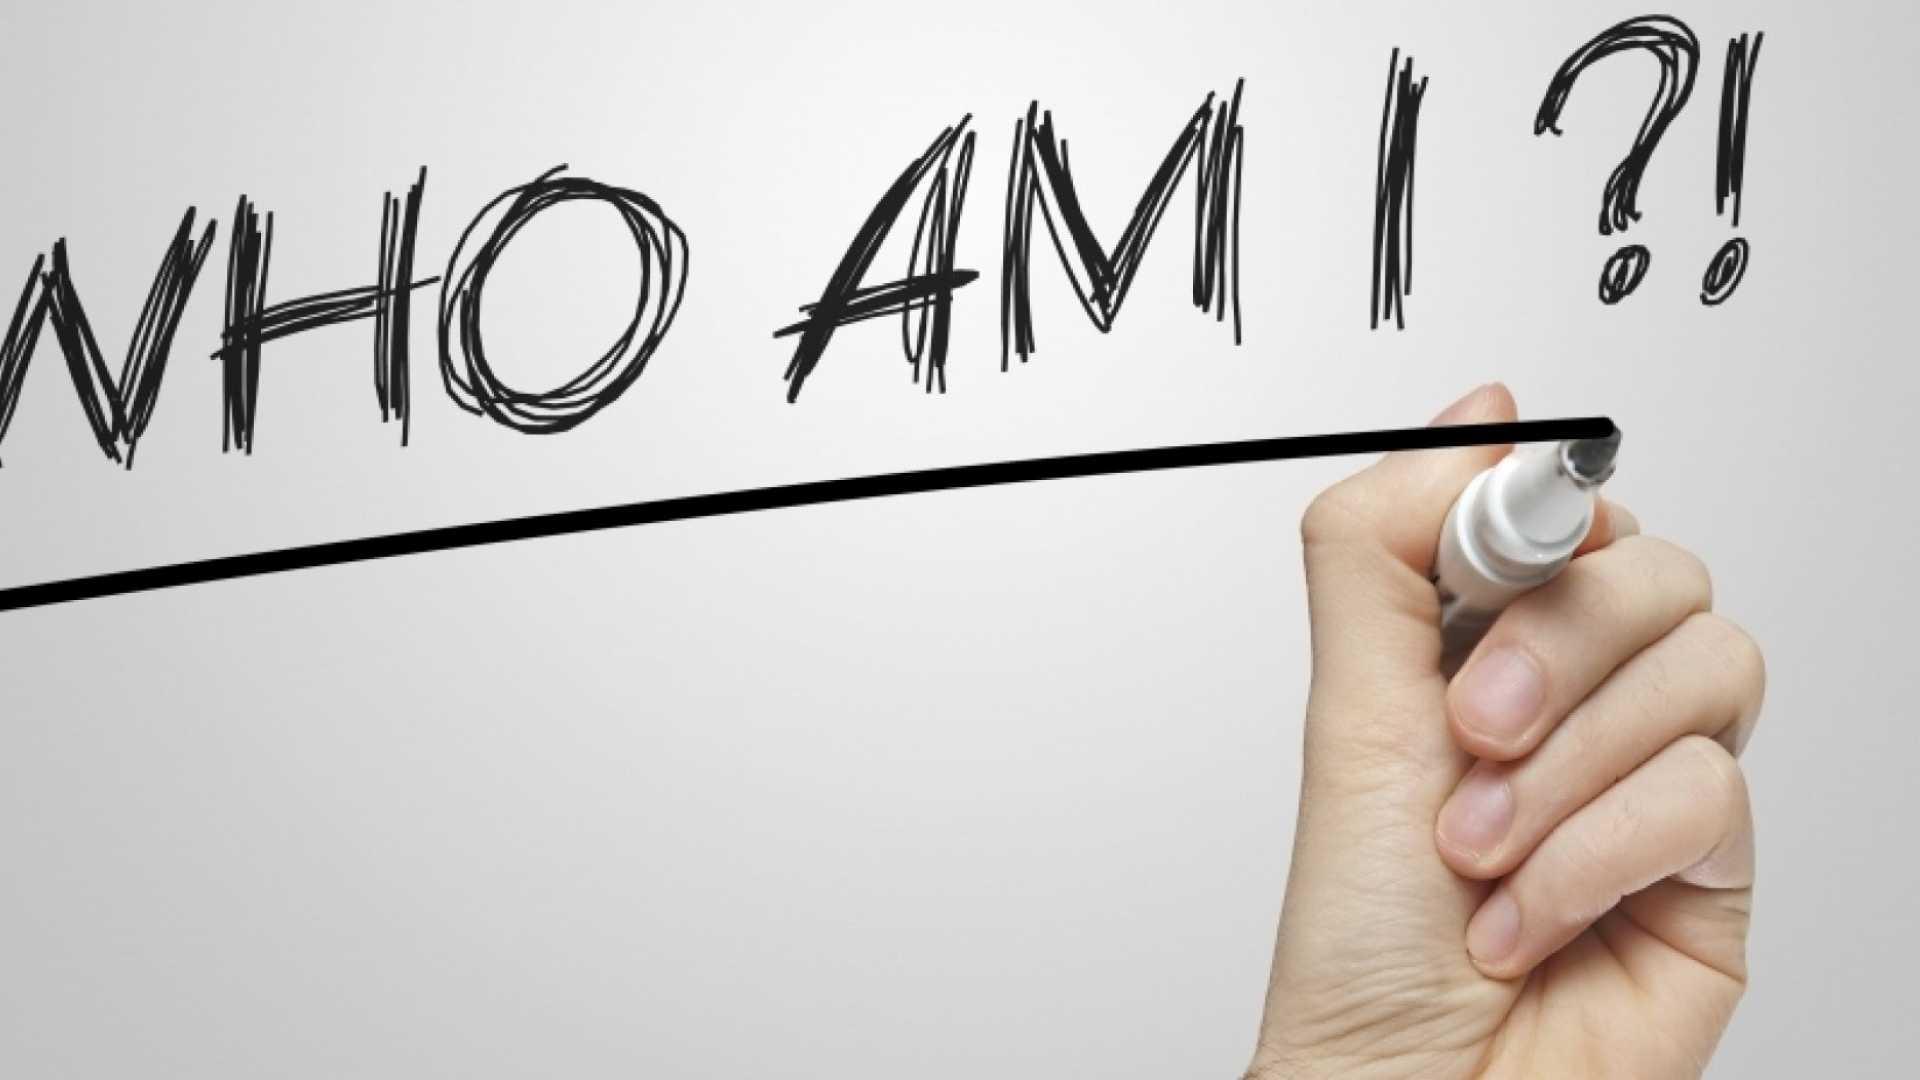 The Secret to Entrepreneurial Branding: Focus on Yourself